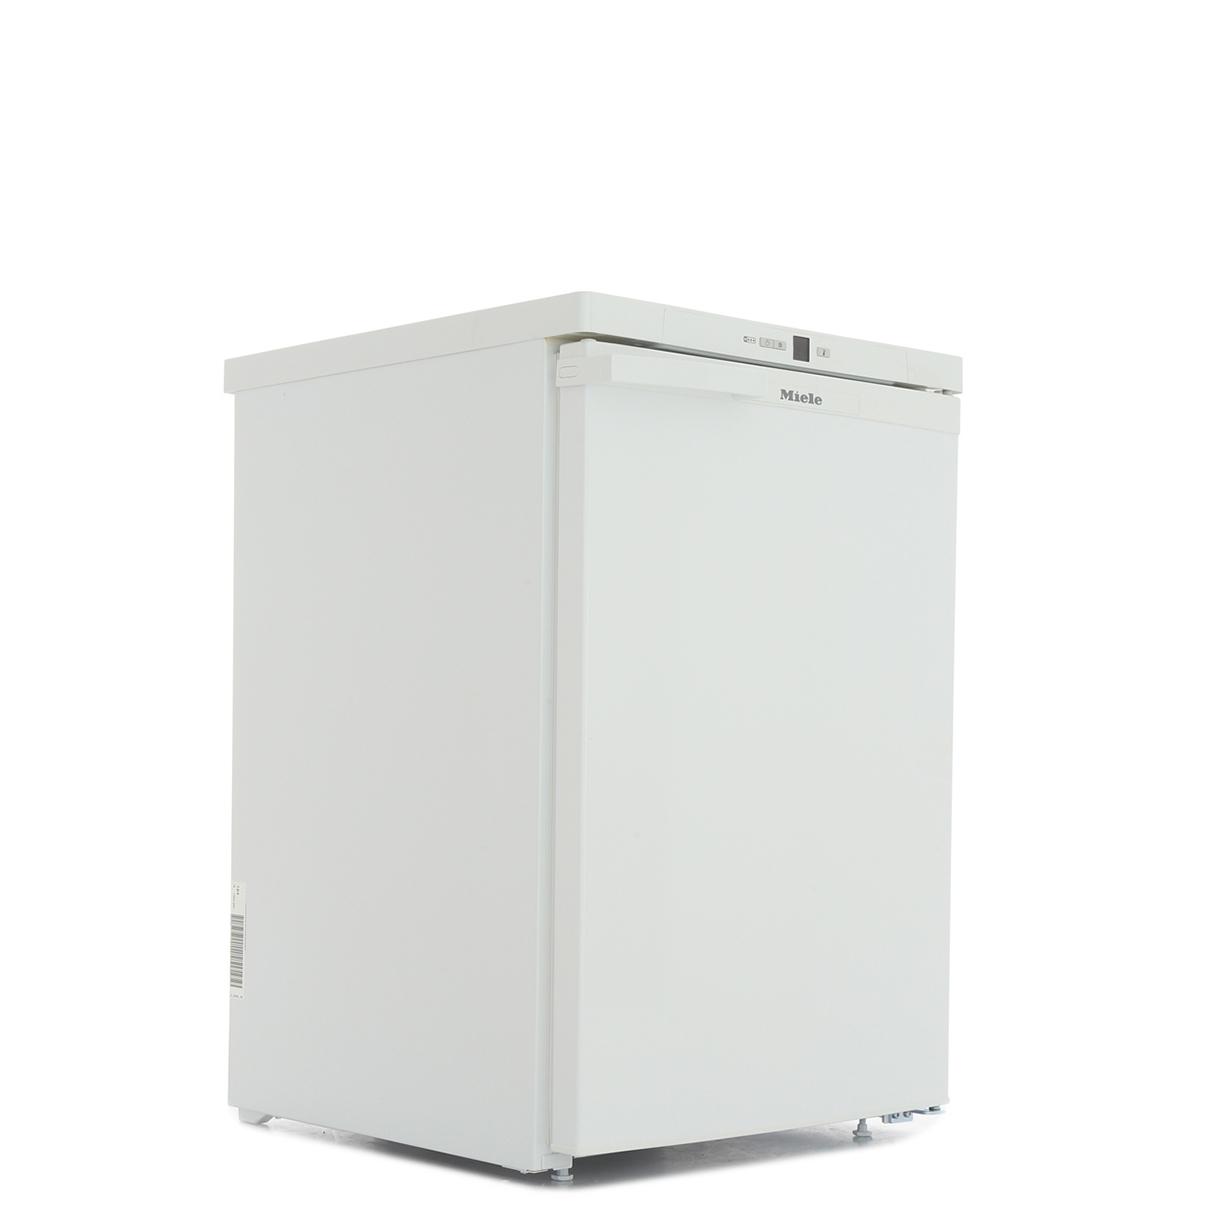 Miele F12011S-1 Static Freezer